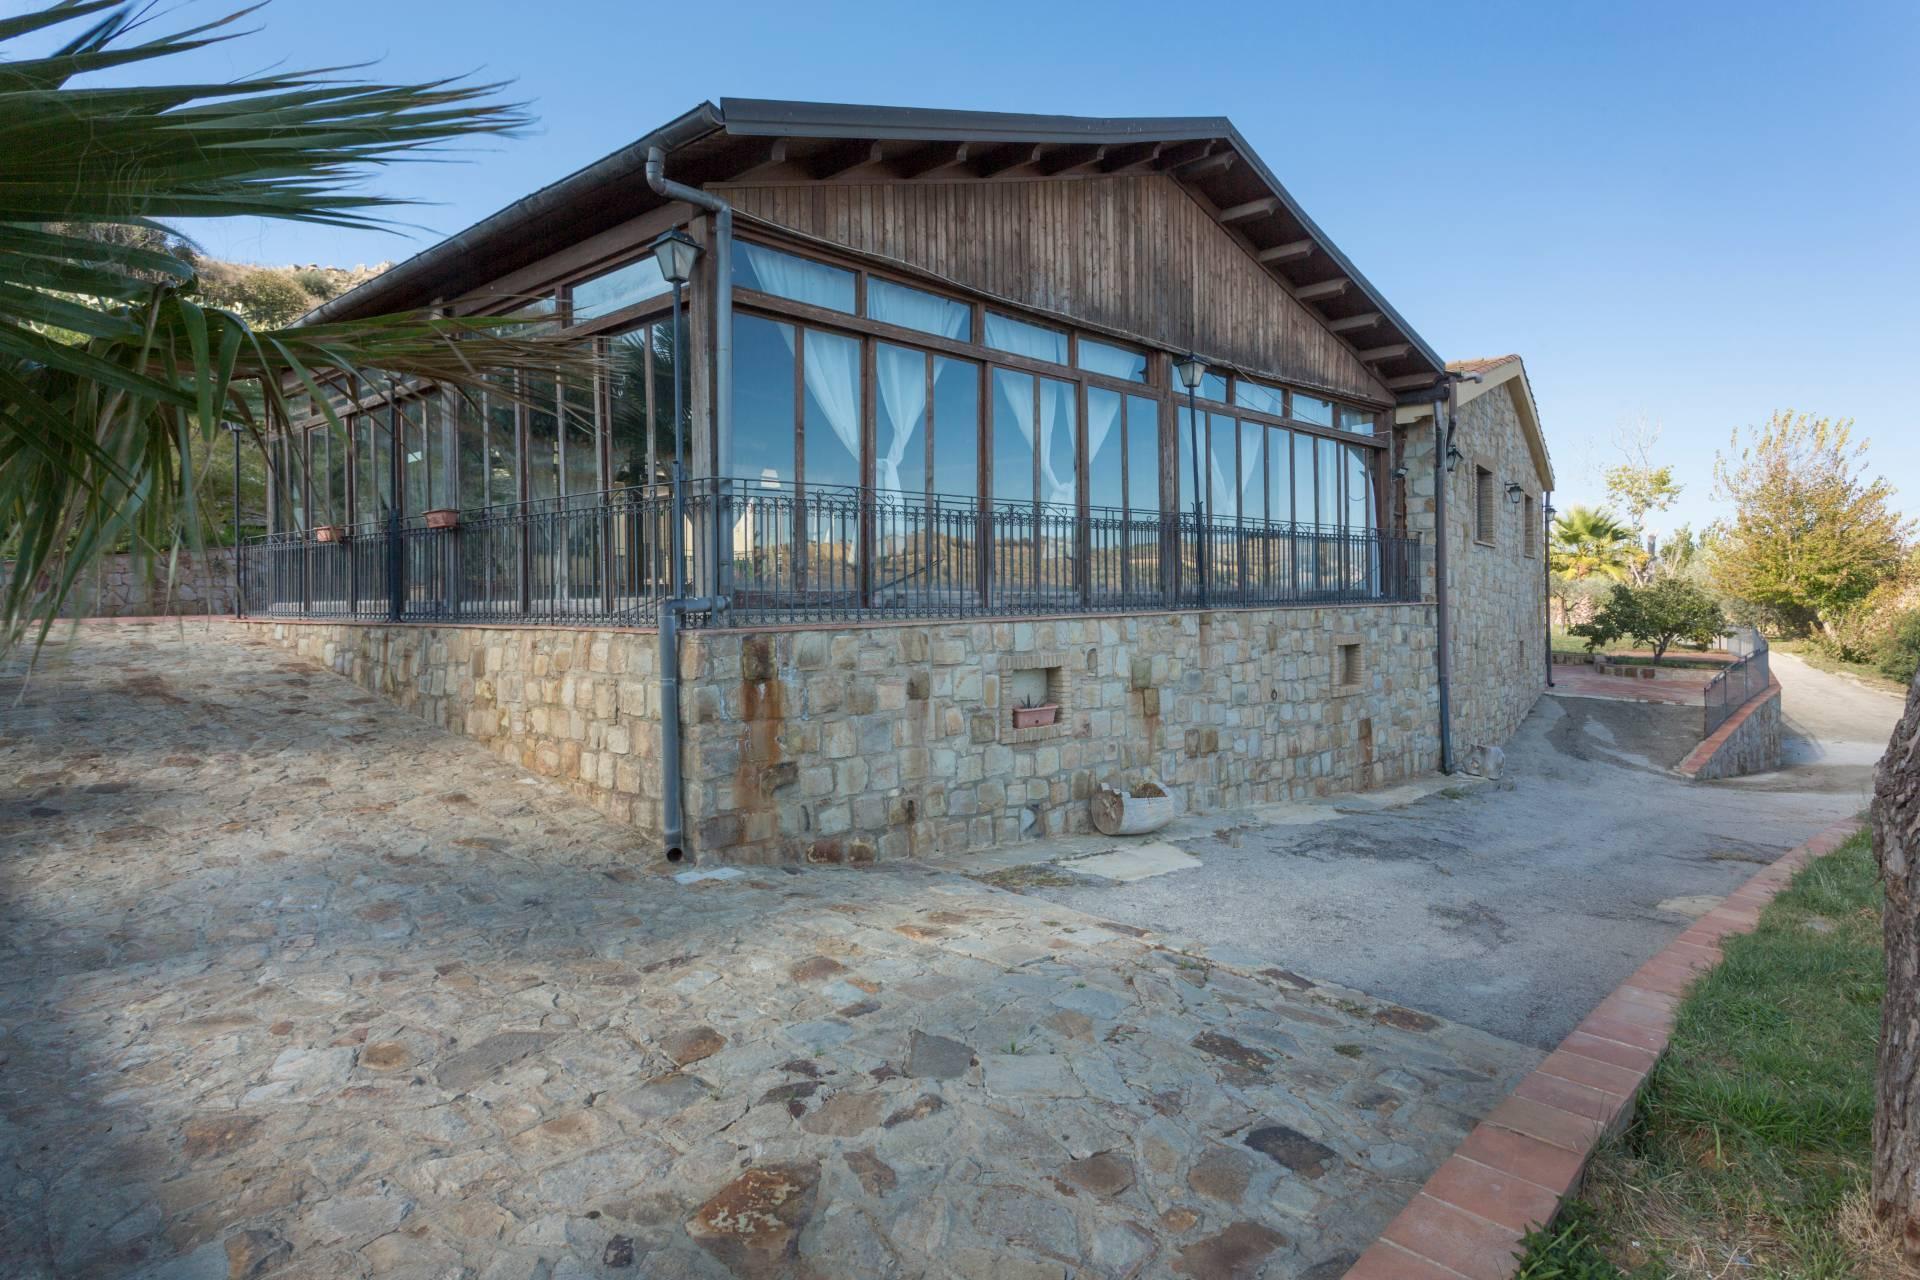 Villa in Vendita a Piazza Armerina: 5 locali, 550 mq - Foto 12